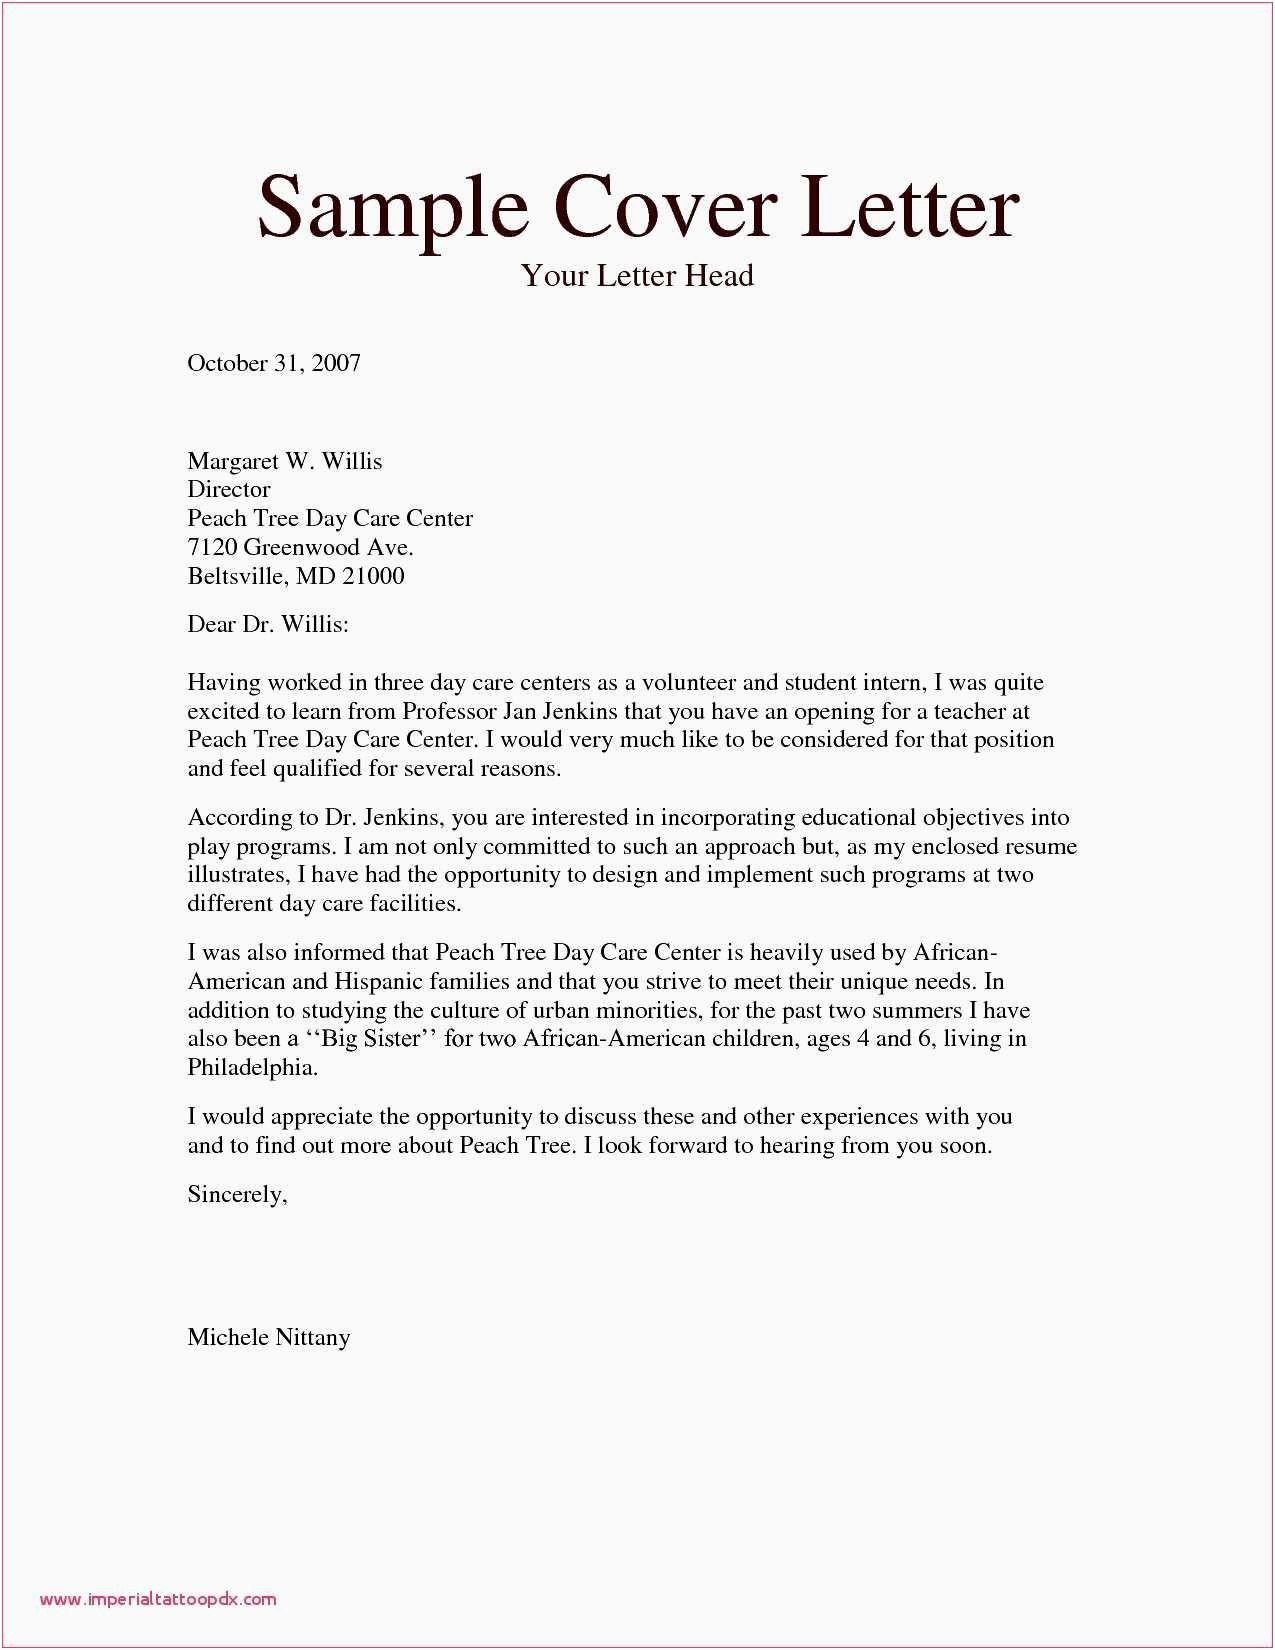 Download New Sample Resume Letter For Job Lettersample